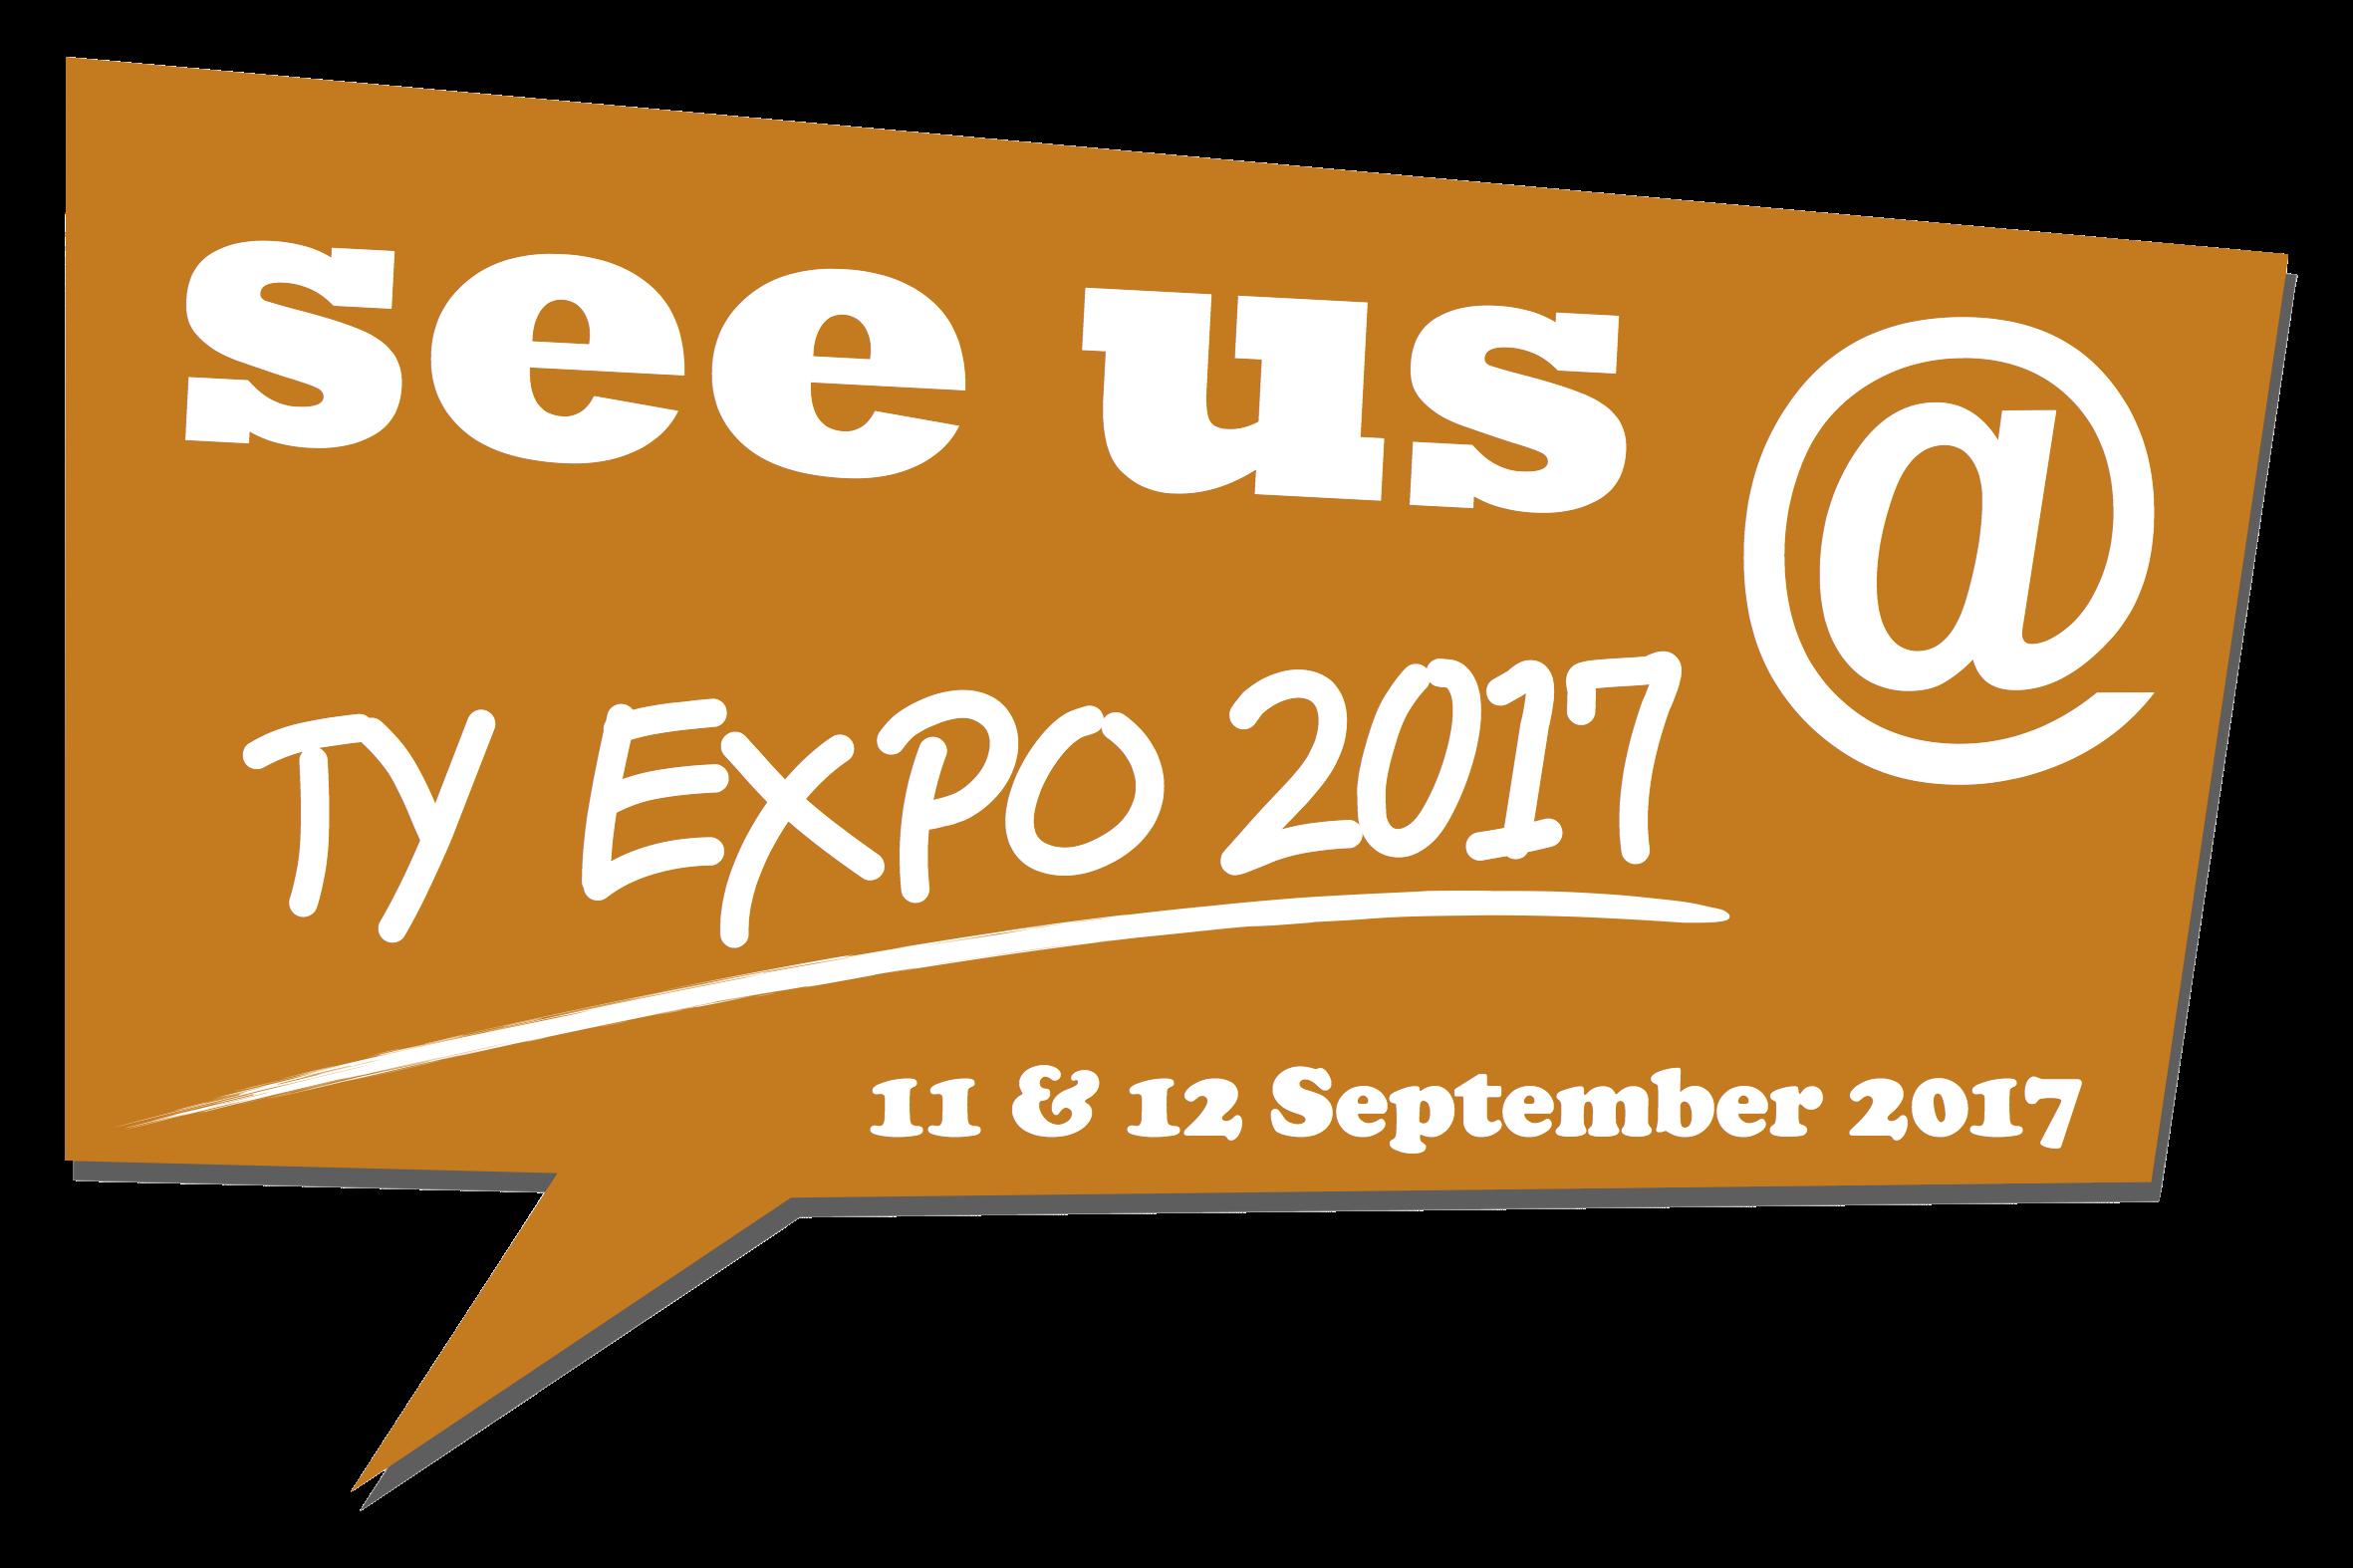 TY Expo 2017